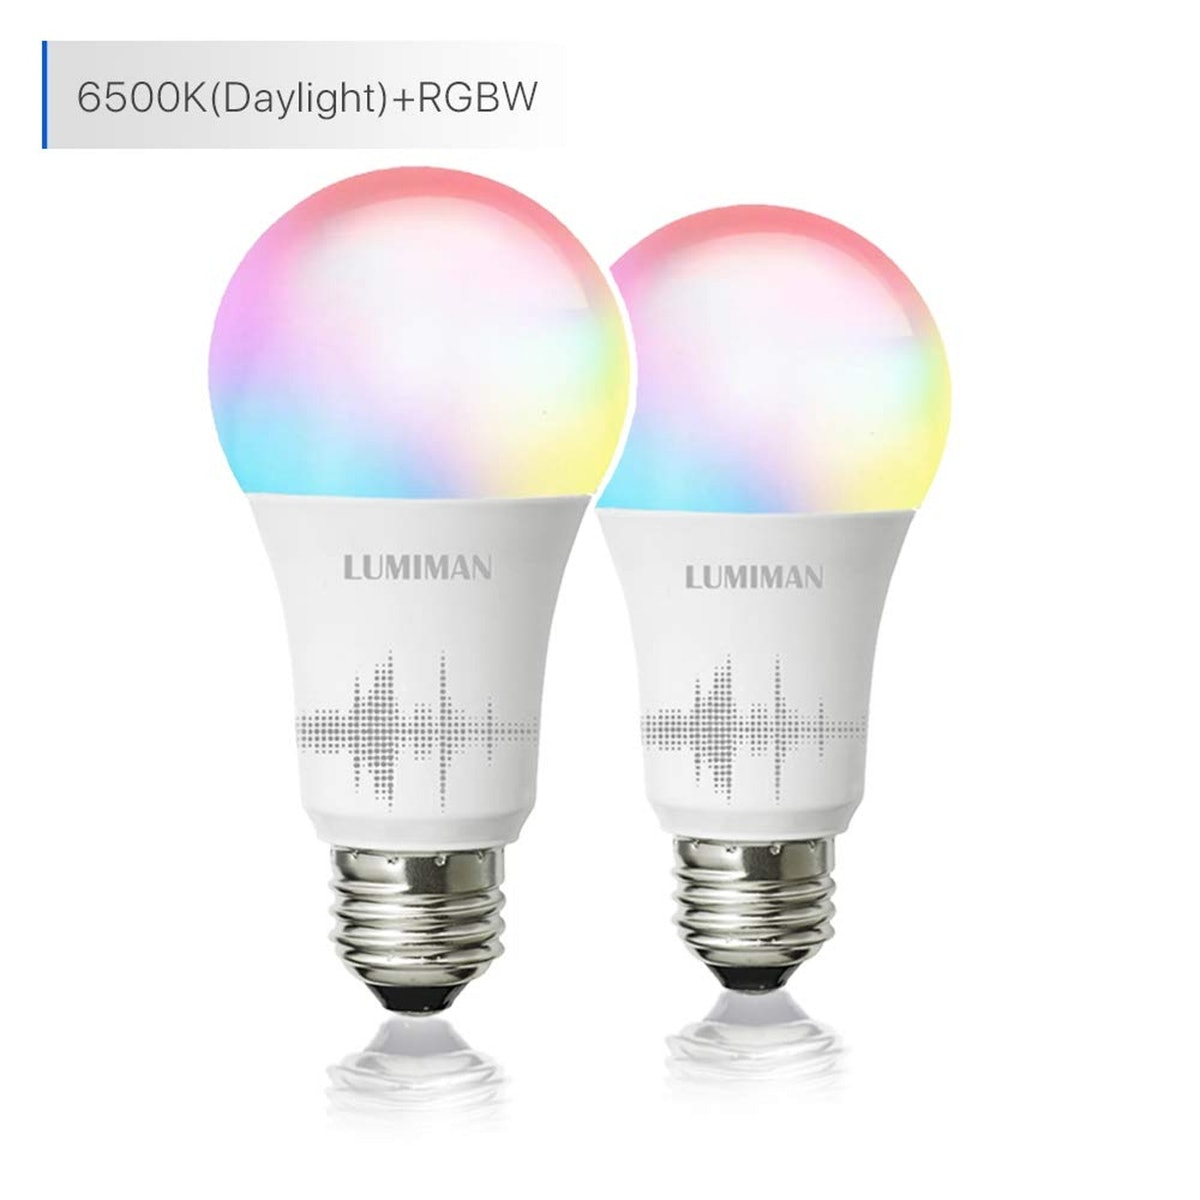 LUMIMAN Smart WiFi LED Bulbs (2-Pack)